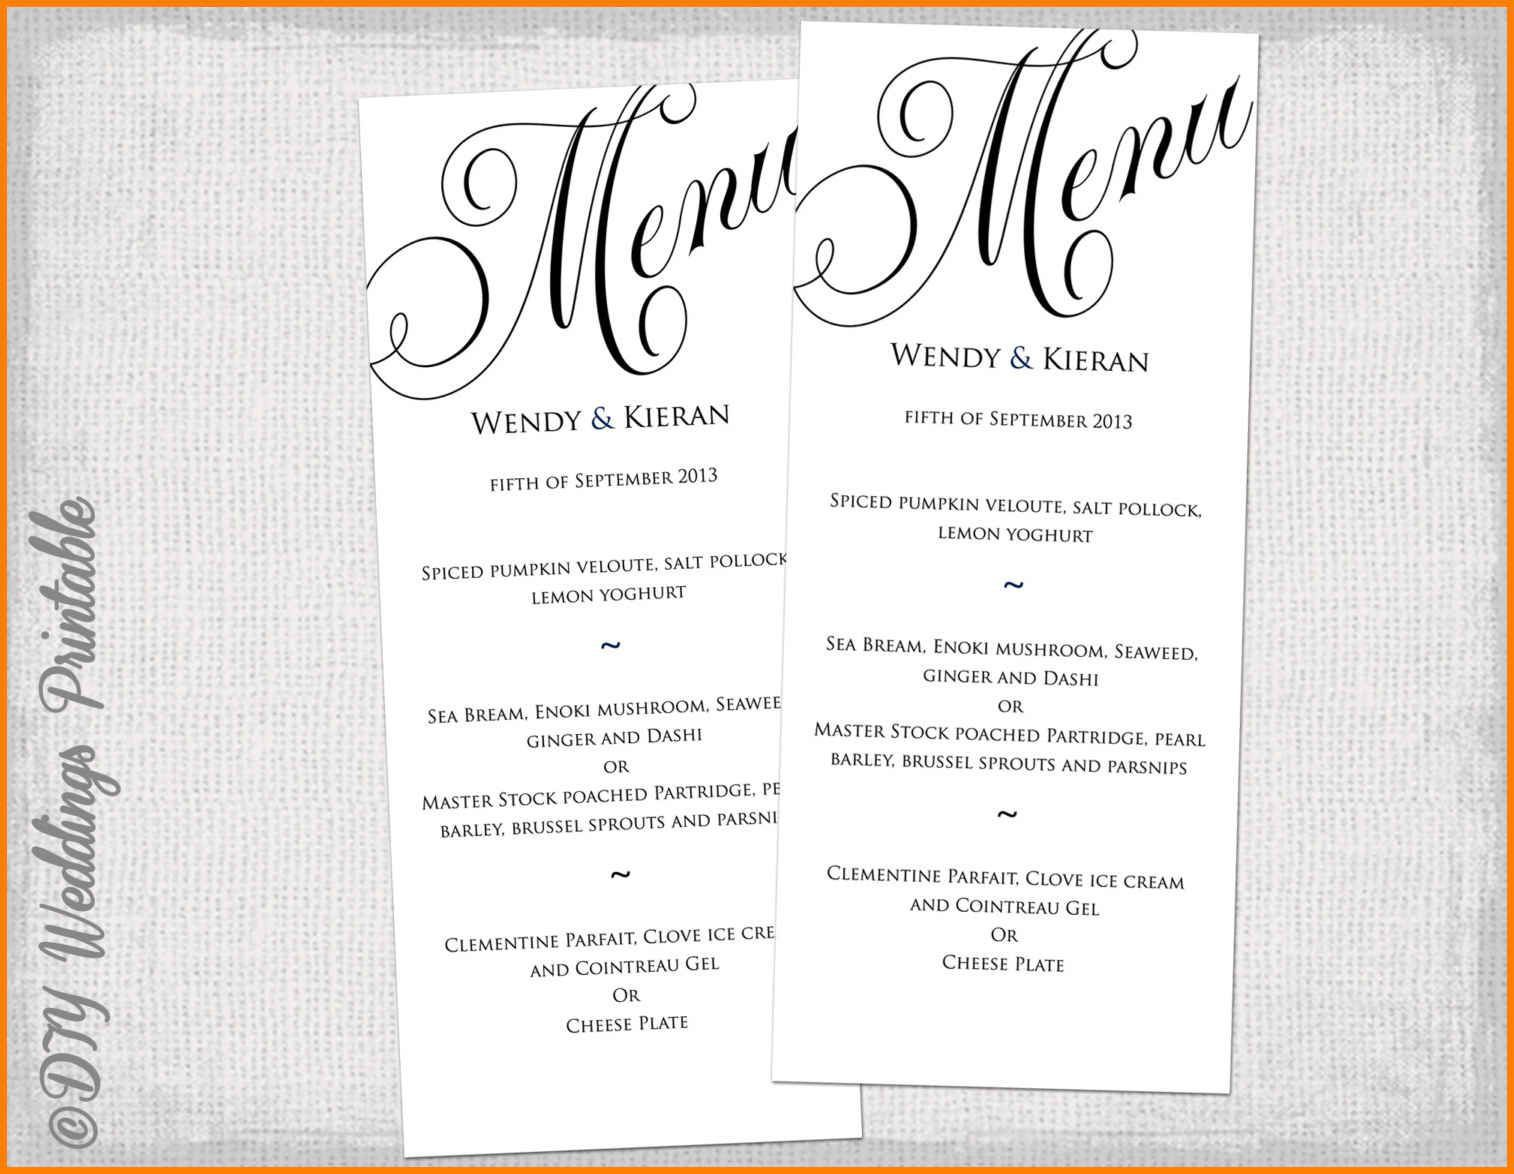 002 Wondrou Dinner Party Menu Template Picture  Word Elegant Free Google DocFull